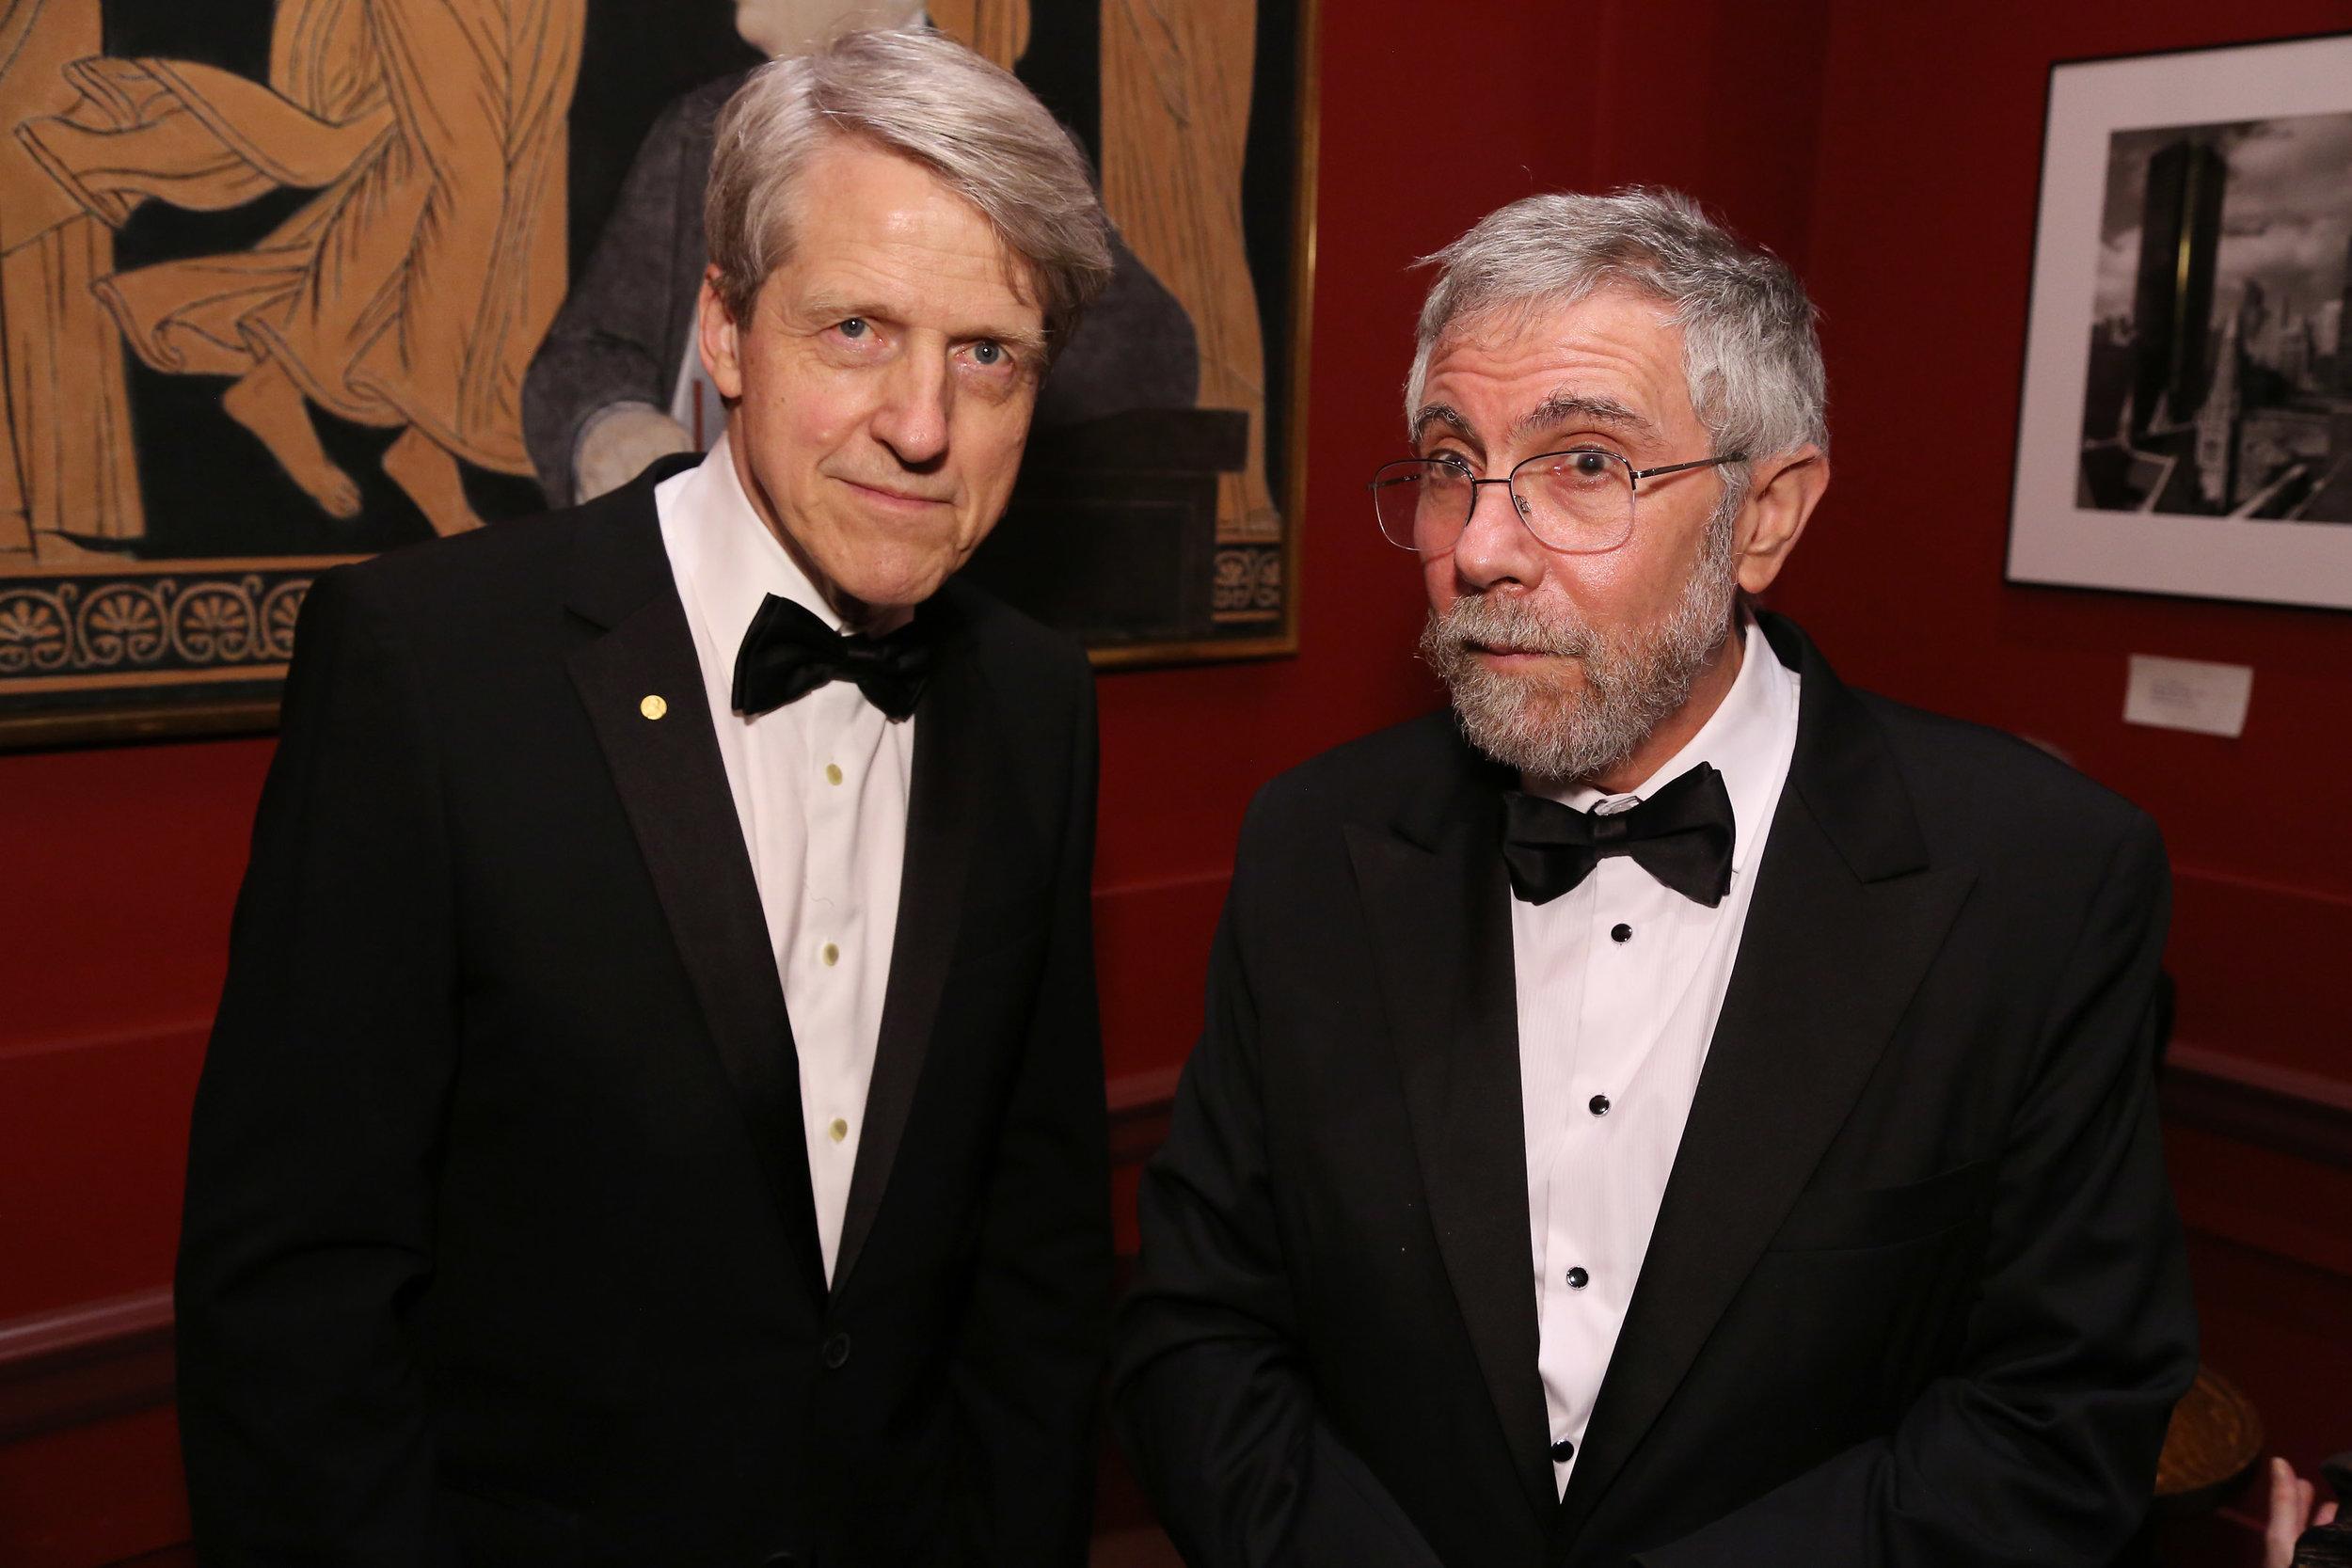 Robert Shiller and Paul Krugman